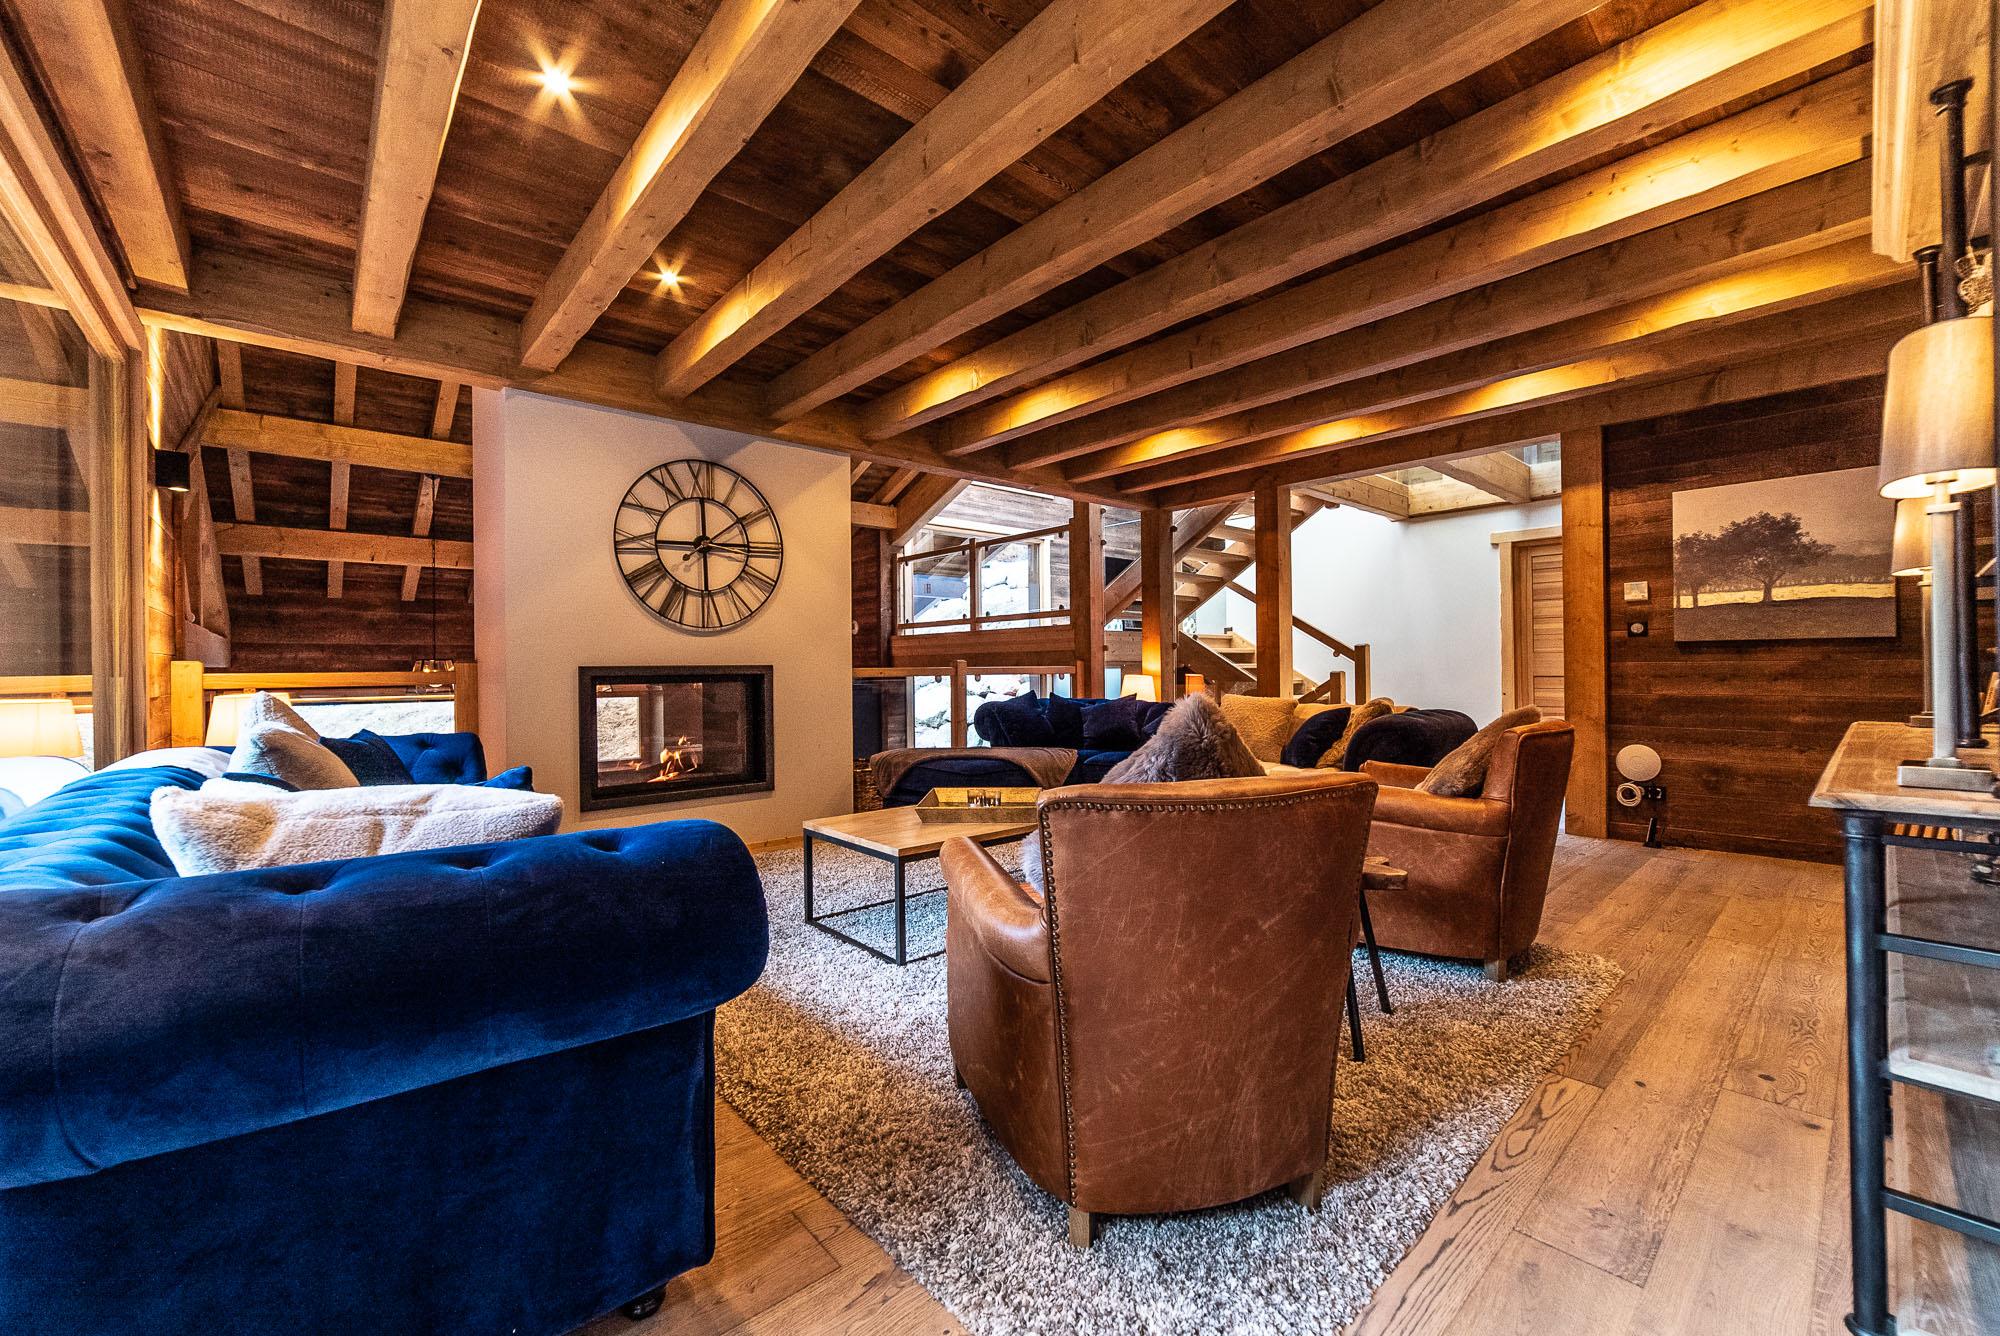 Chalet Foret D'Argent: Luxury Morzine ski chalet in la Manche